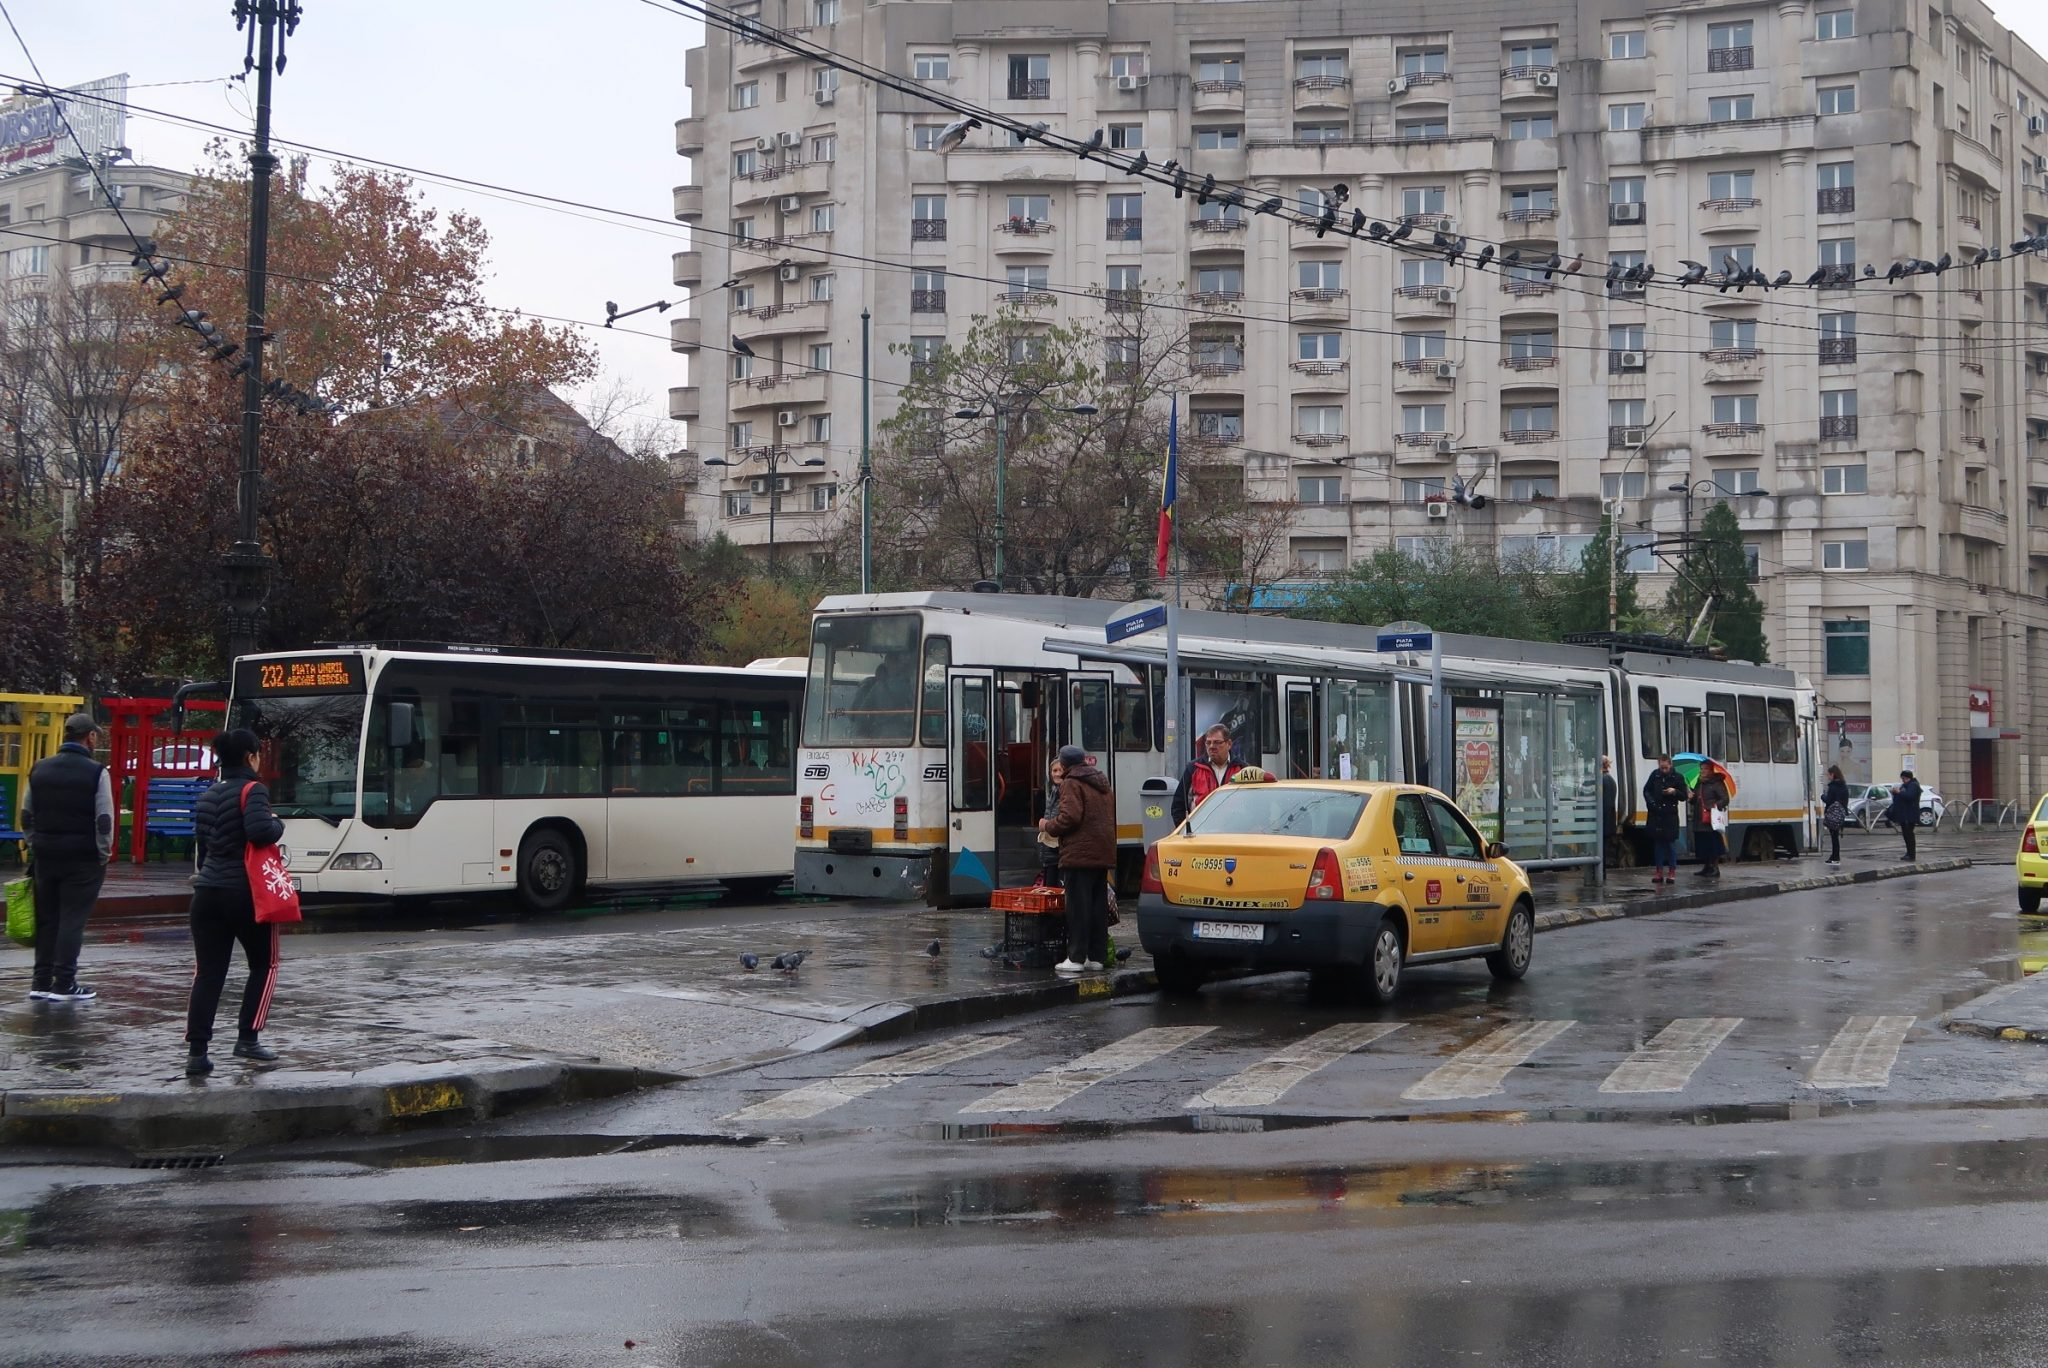 Bukarest liikenne